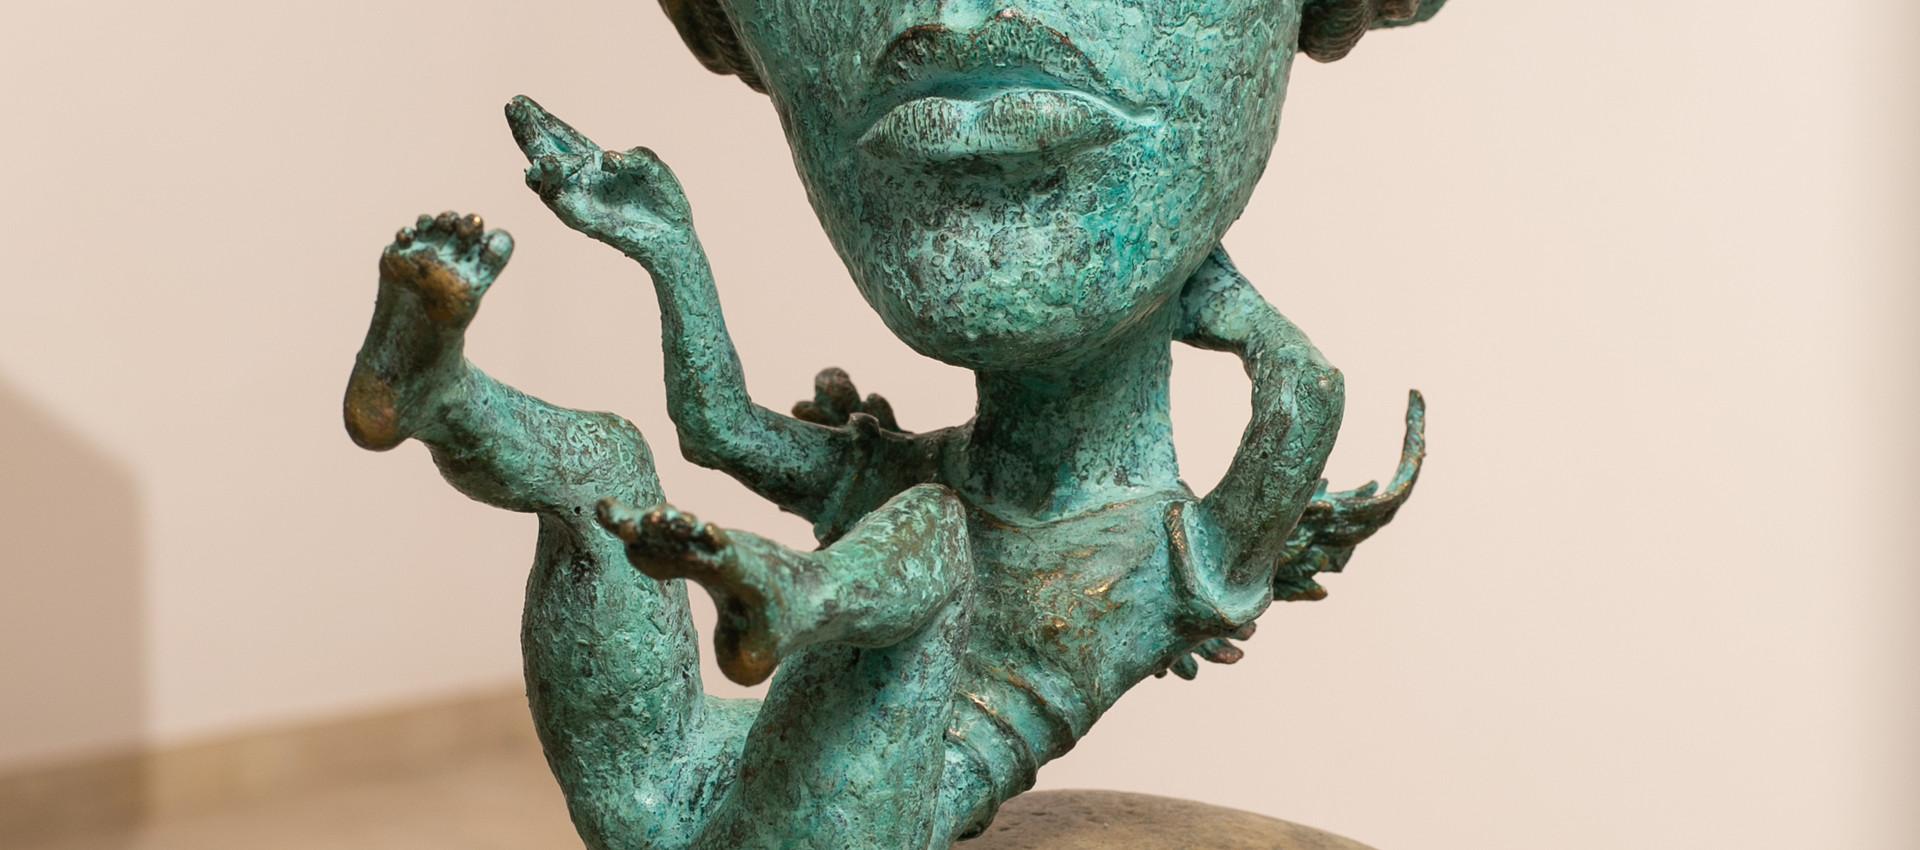 Alina Bachurina. Gnossienne IV, 2020, bronze, stone, 52х26 cm